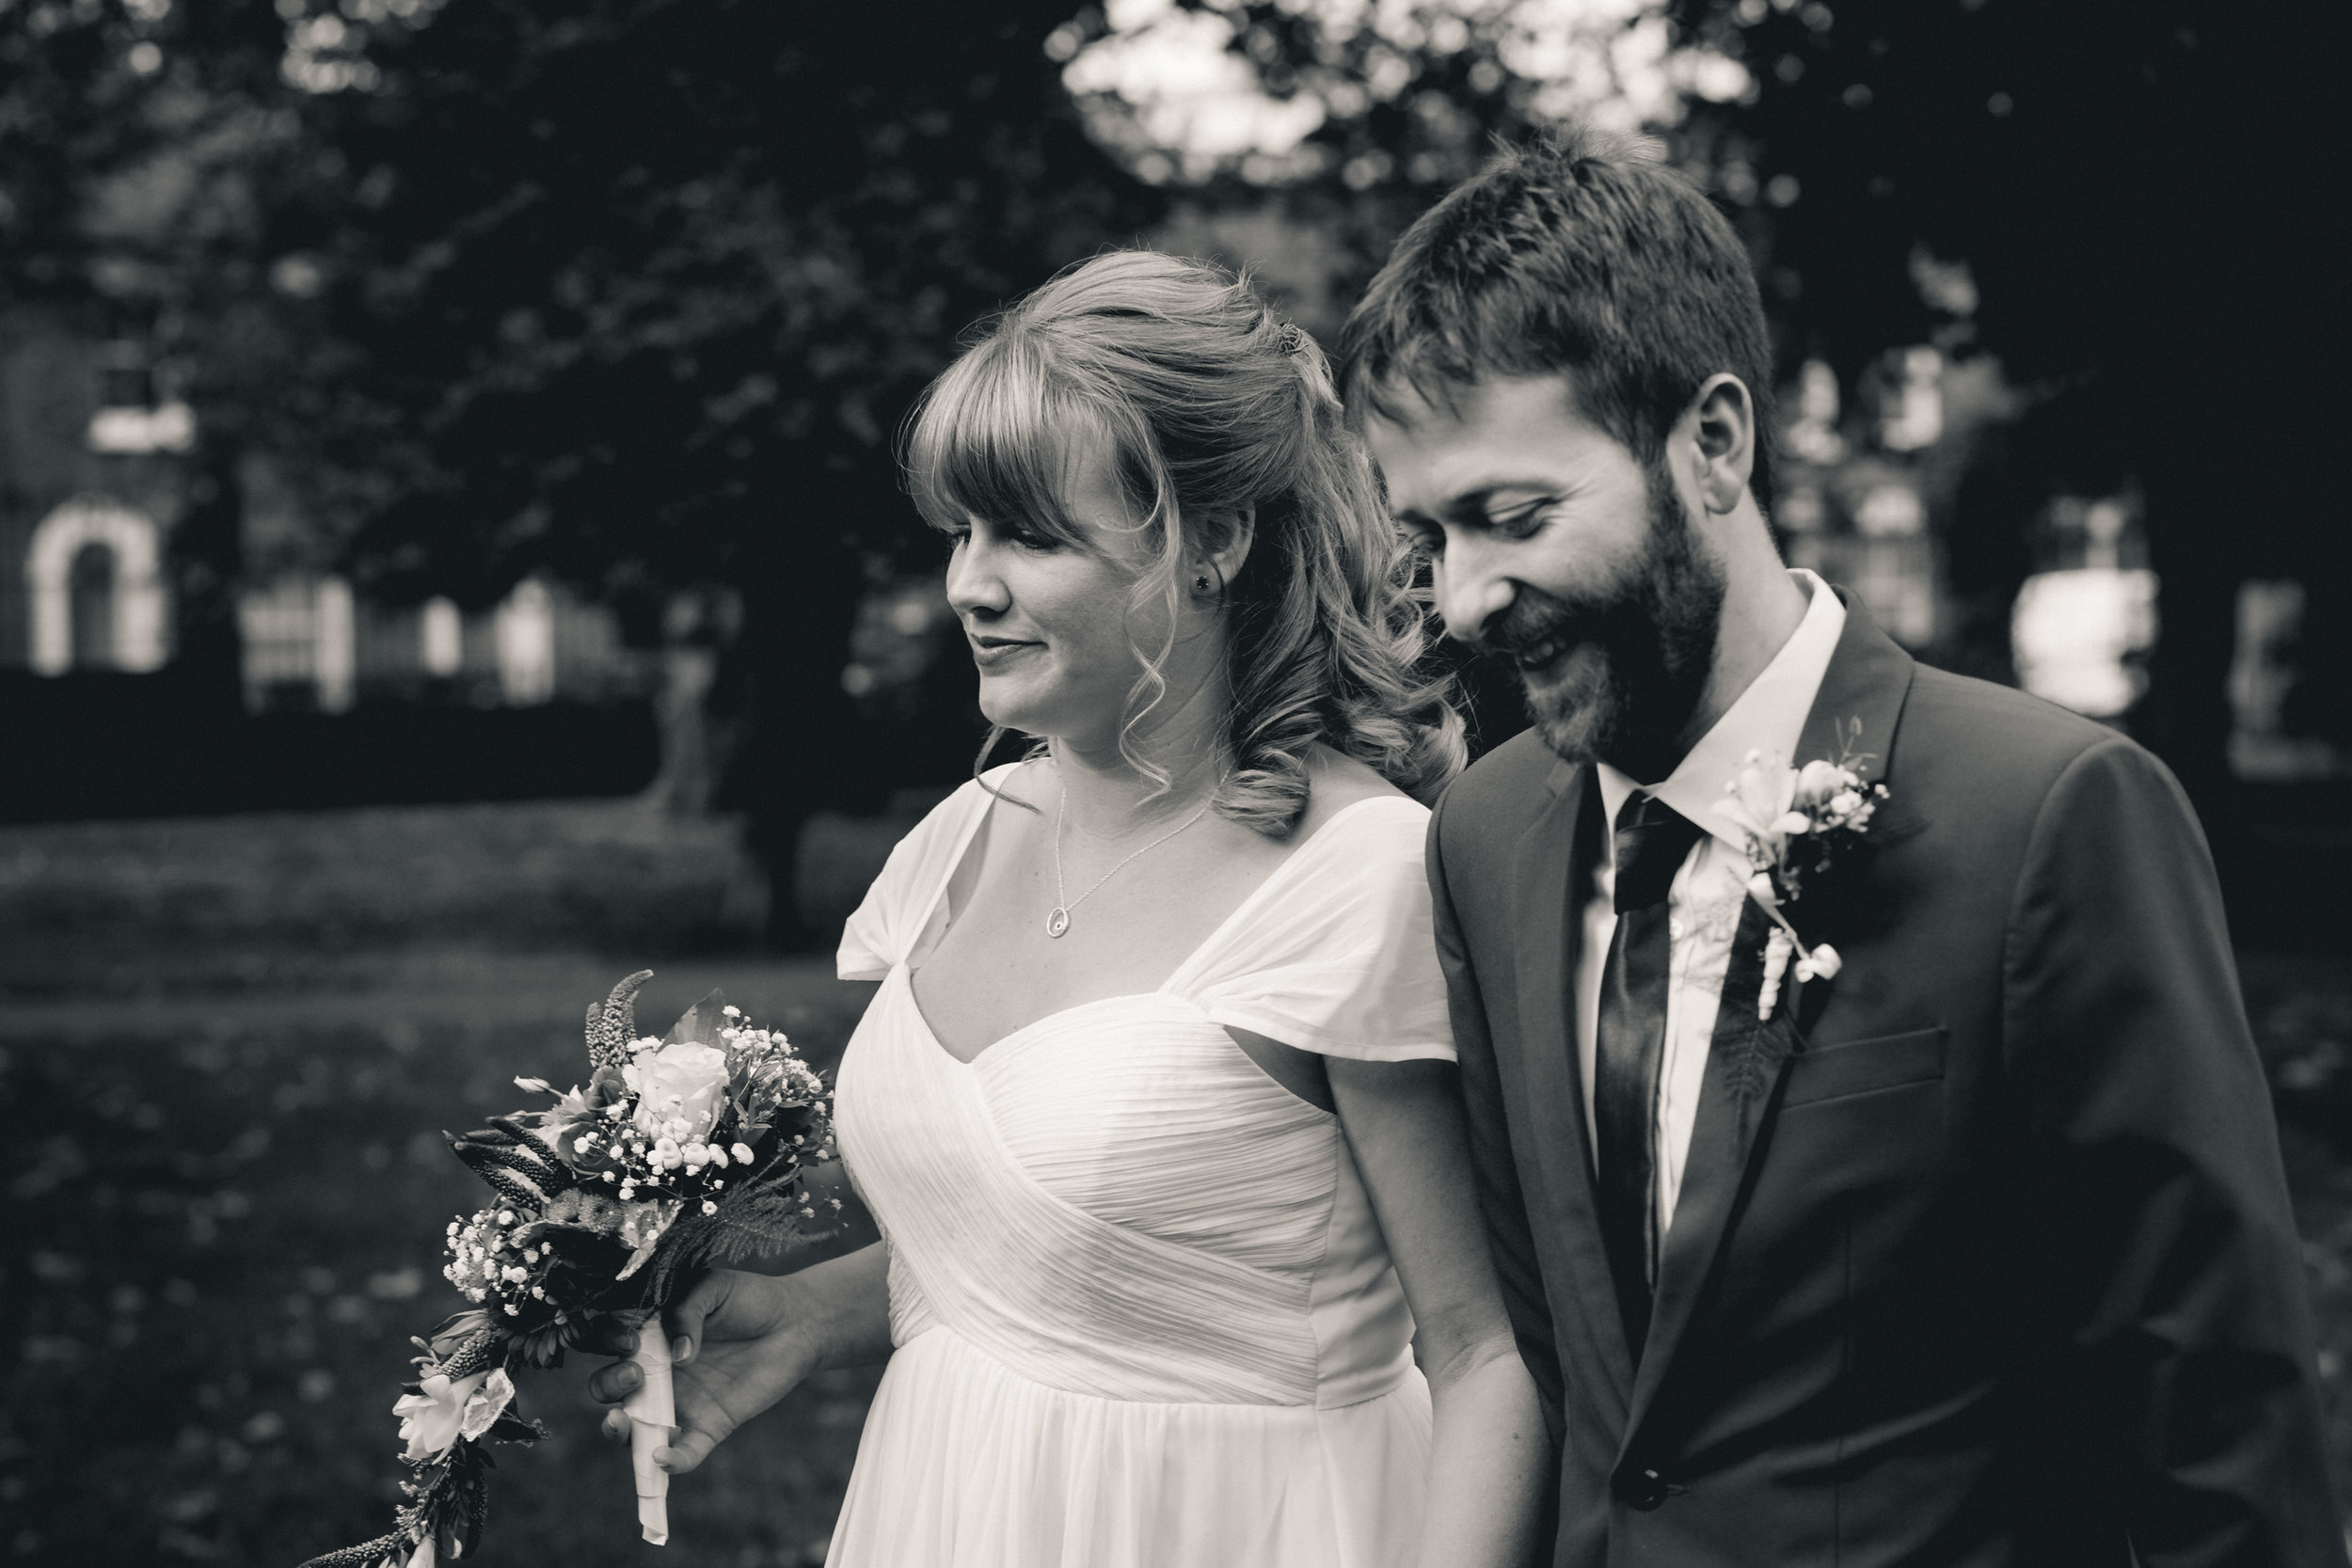 Candid Wedding Couple Portrait in Lucas Gardens, Peckham, London